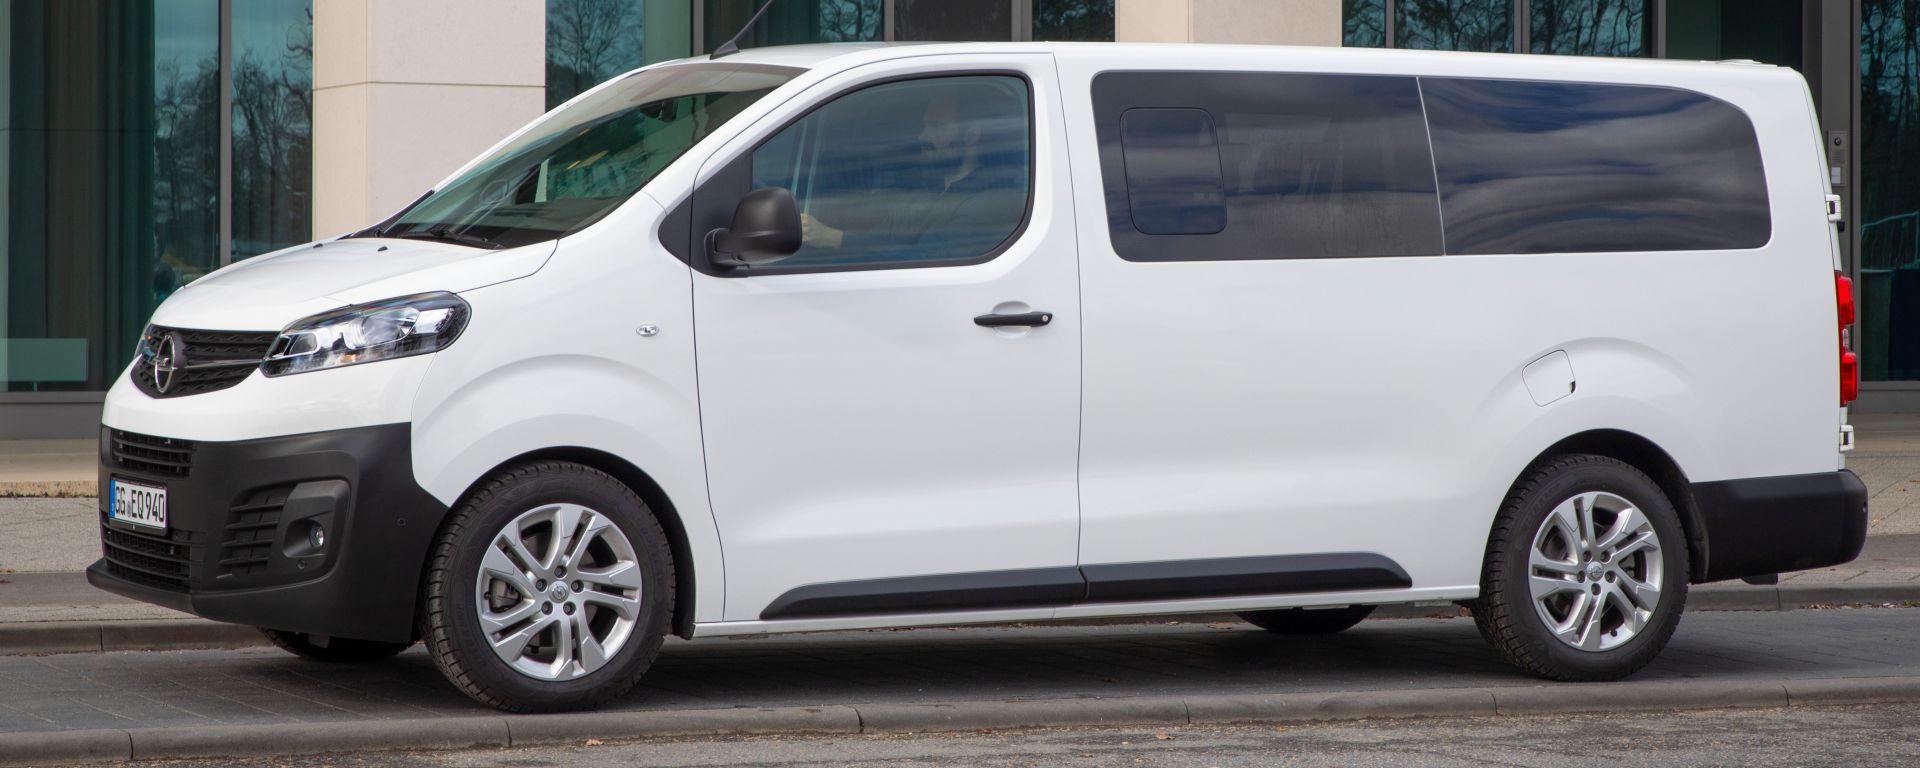 Opel Vivaro Laterale